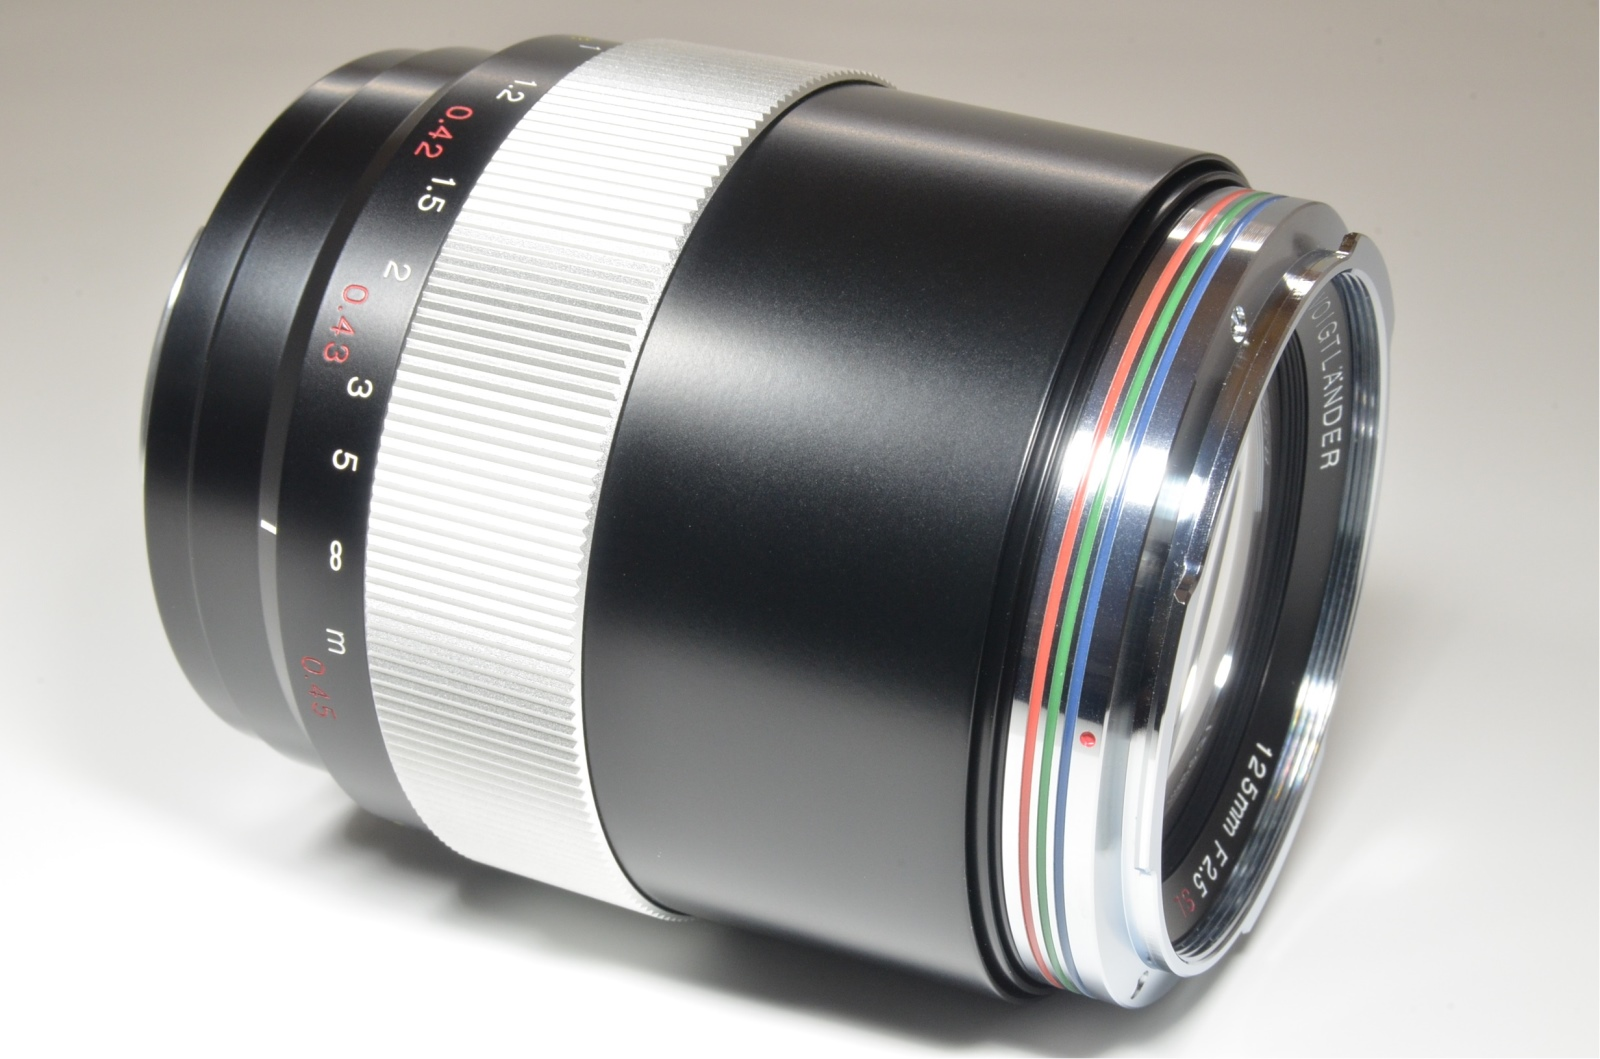 voigtlander macro apo-lanthar 125mm f2.5 sl for ef mount canon